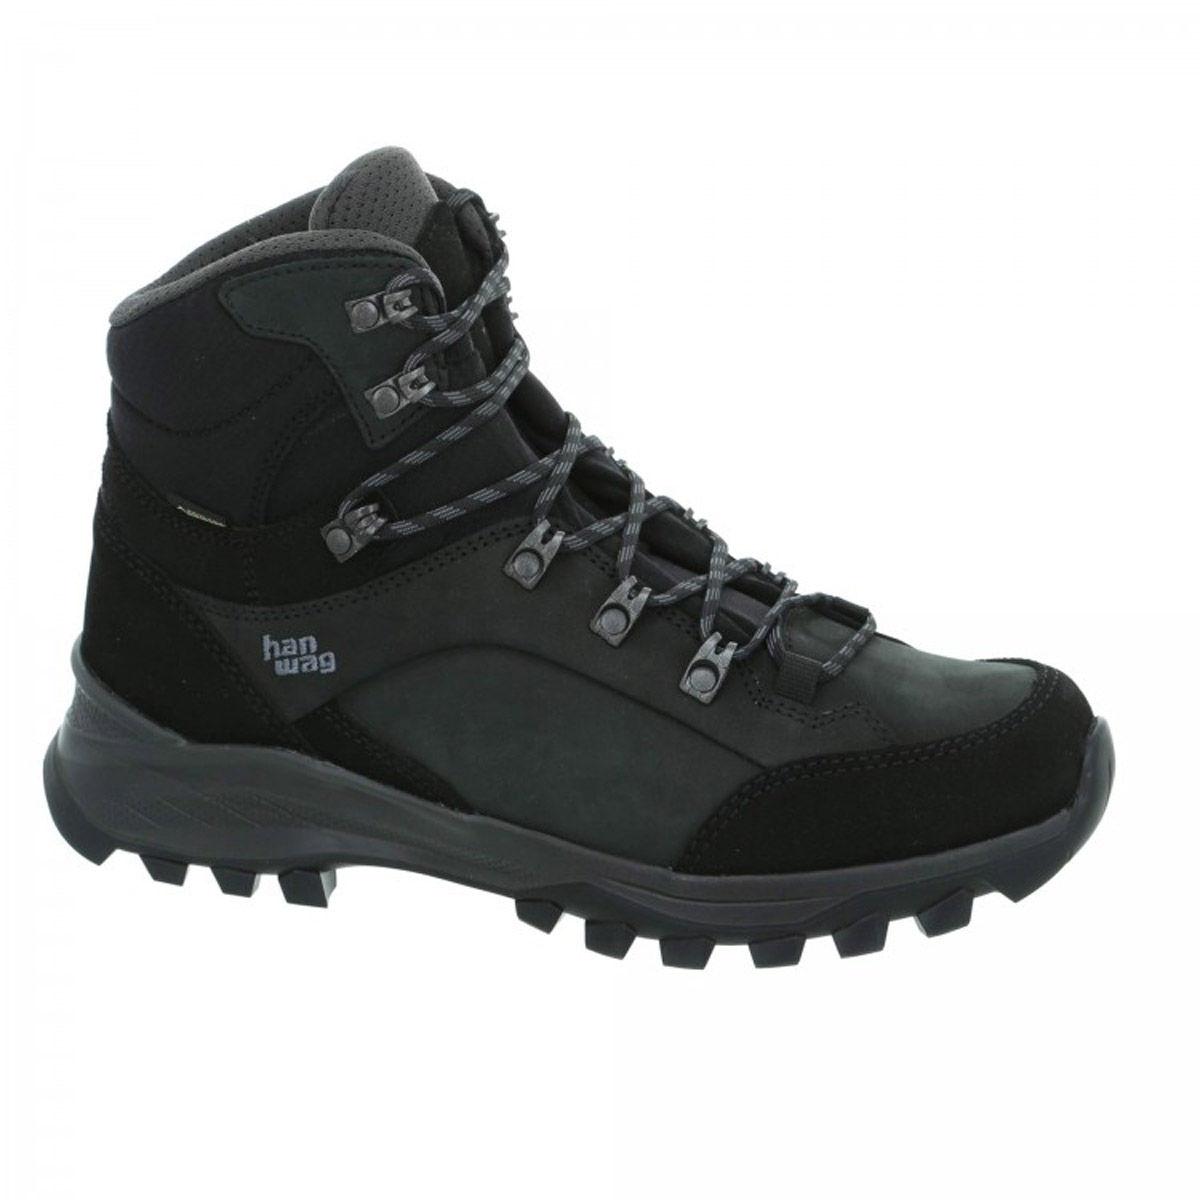 Hanwag Banks GTX Boots - Black/Asphalt